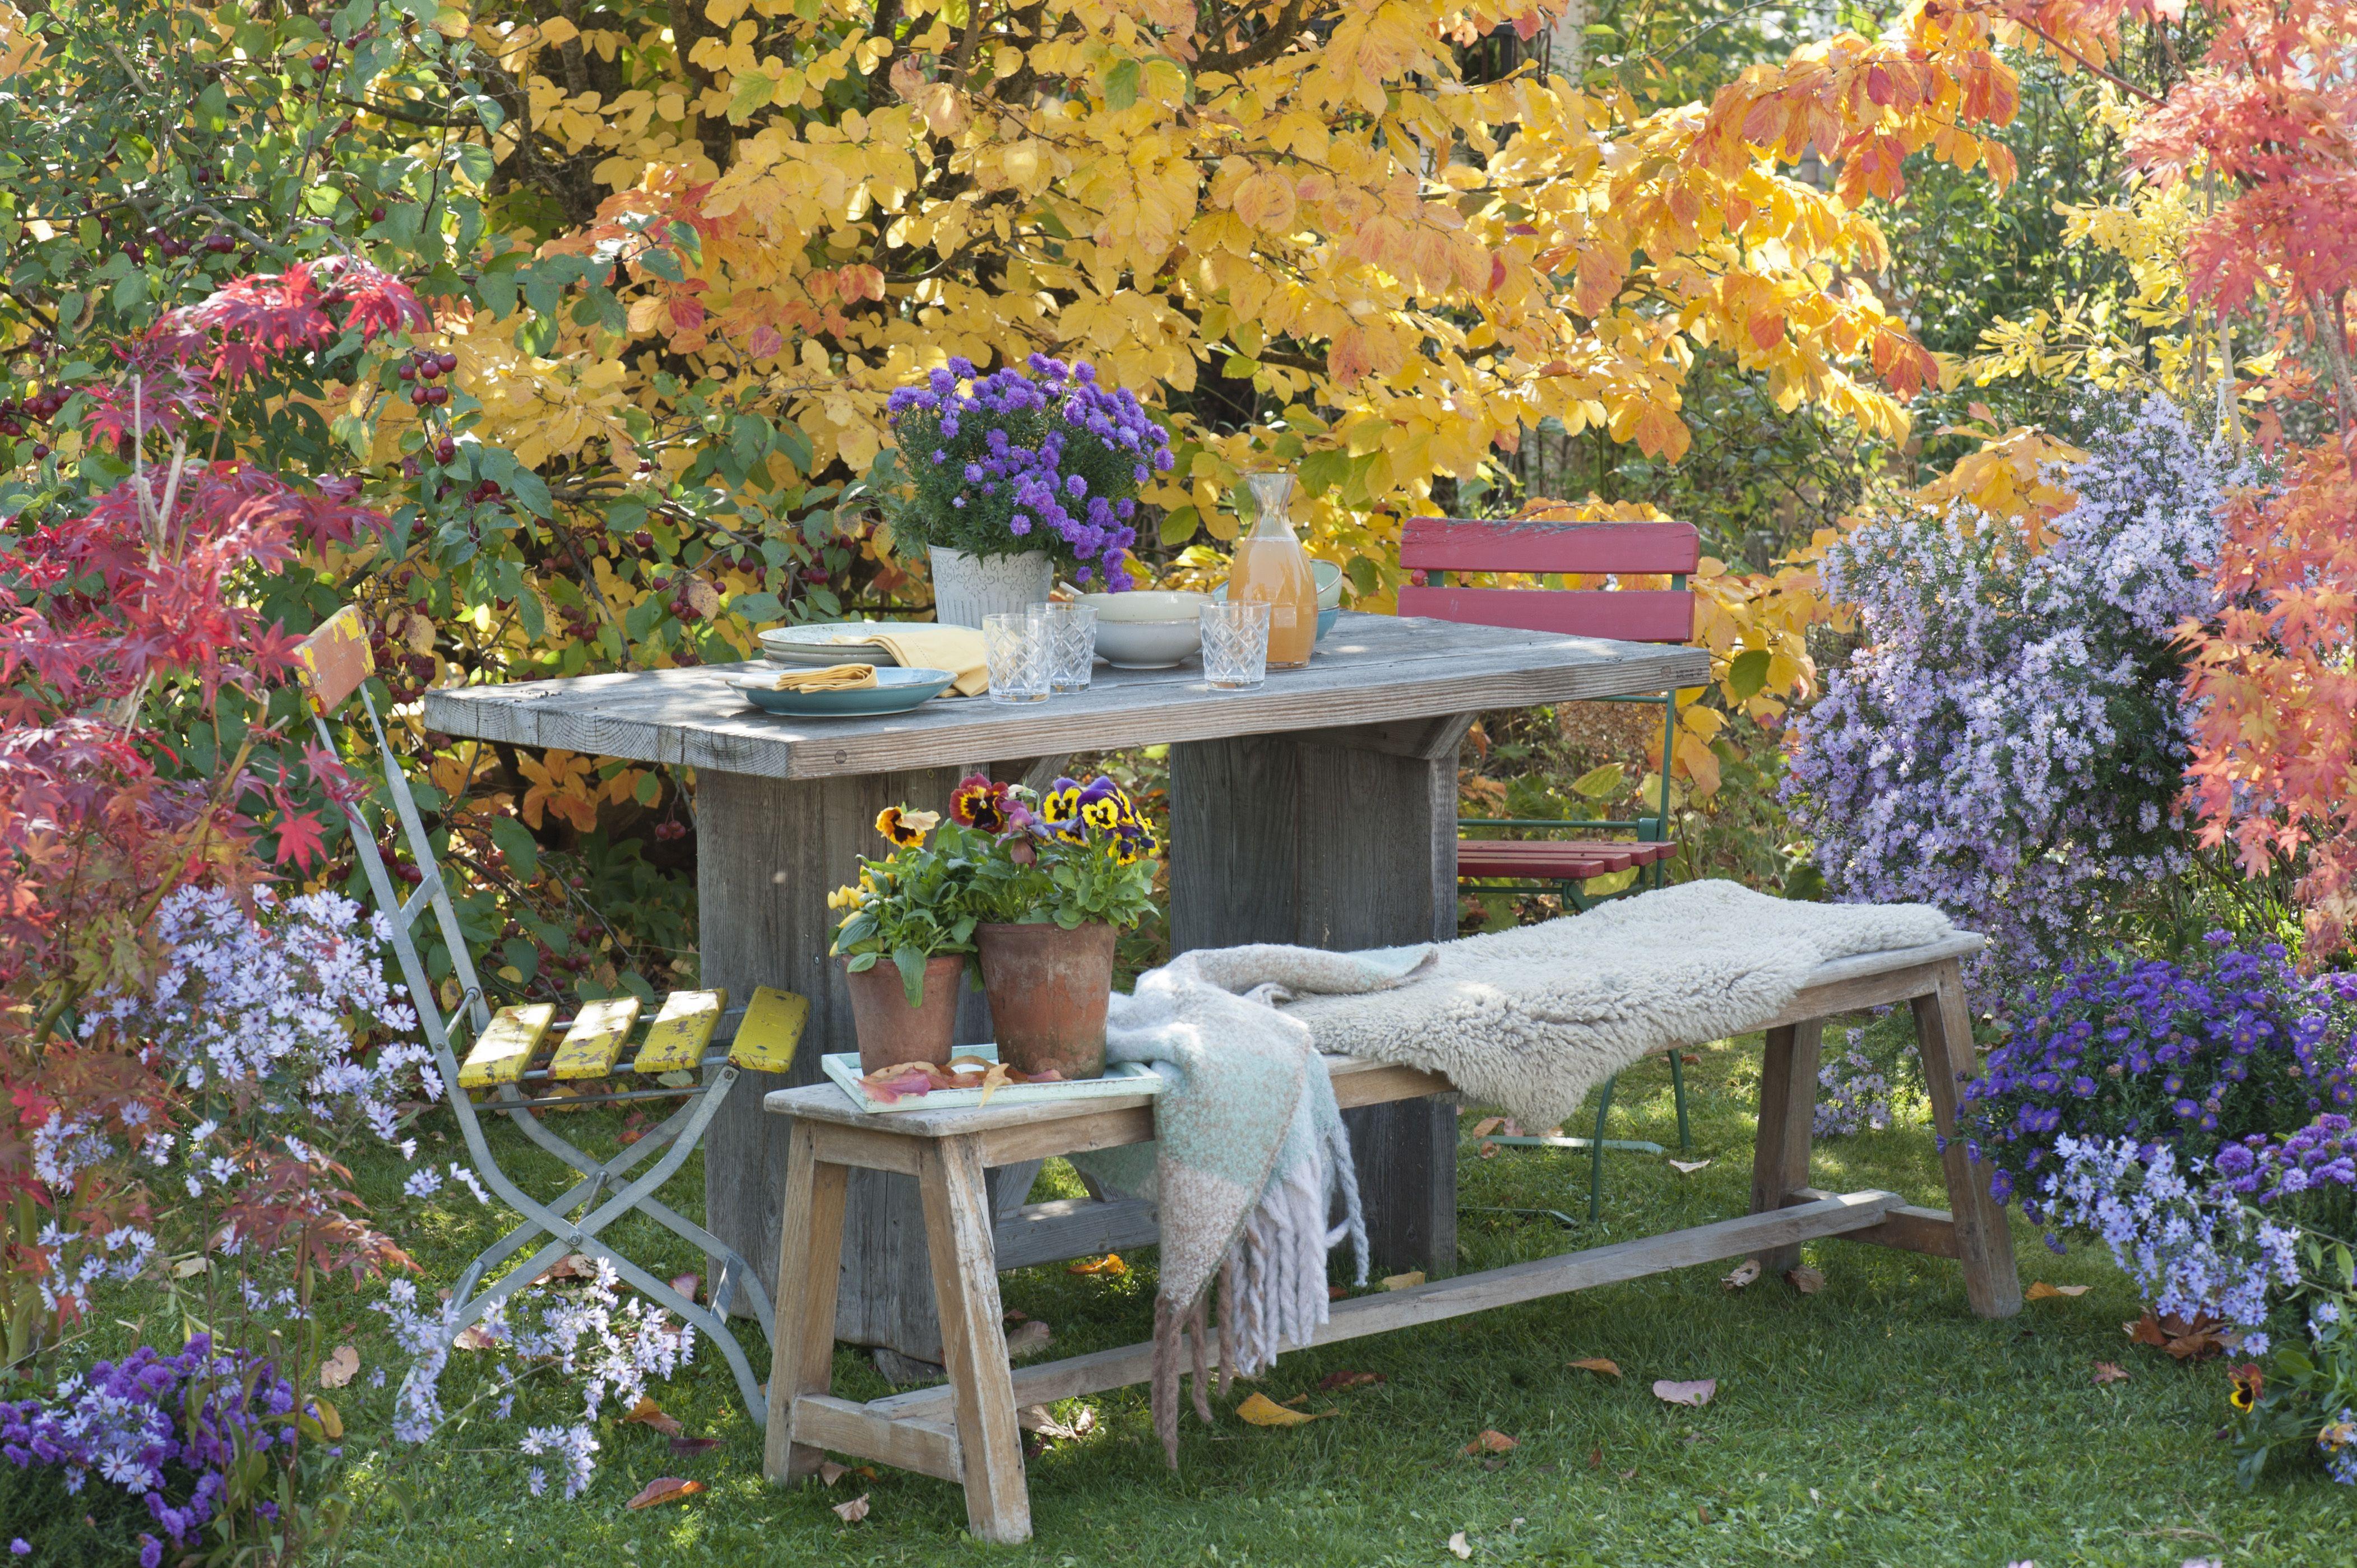 Herbstbluher Fur Den Garten Gartengestaltung Steingarten Garten